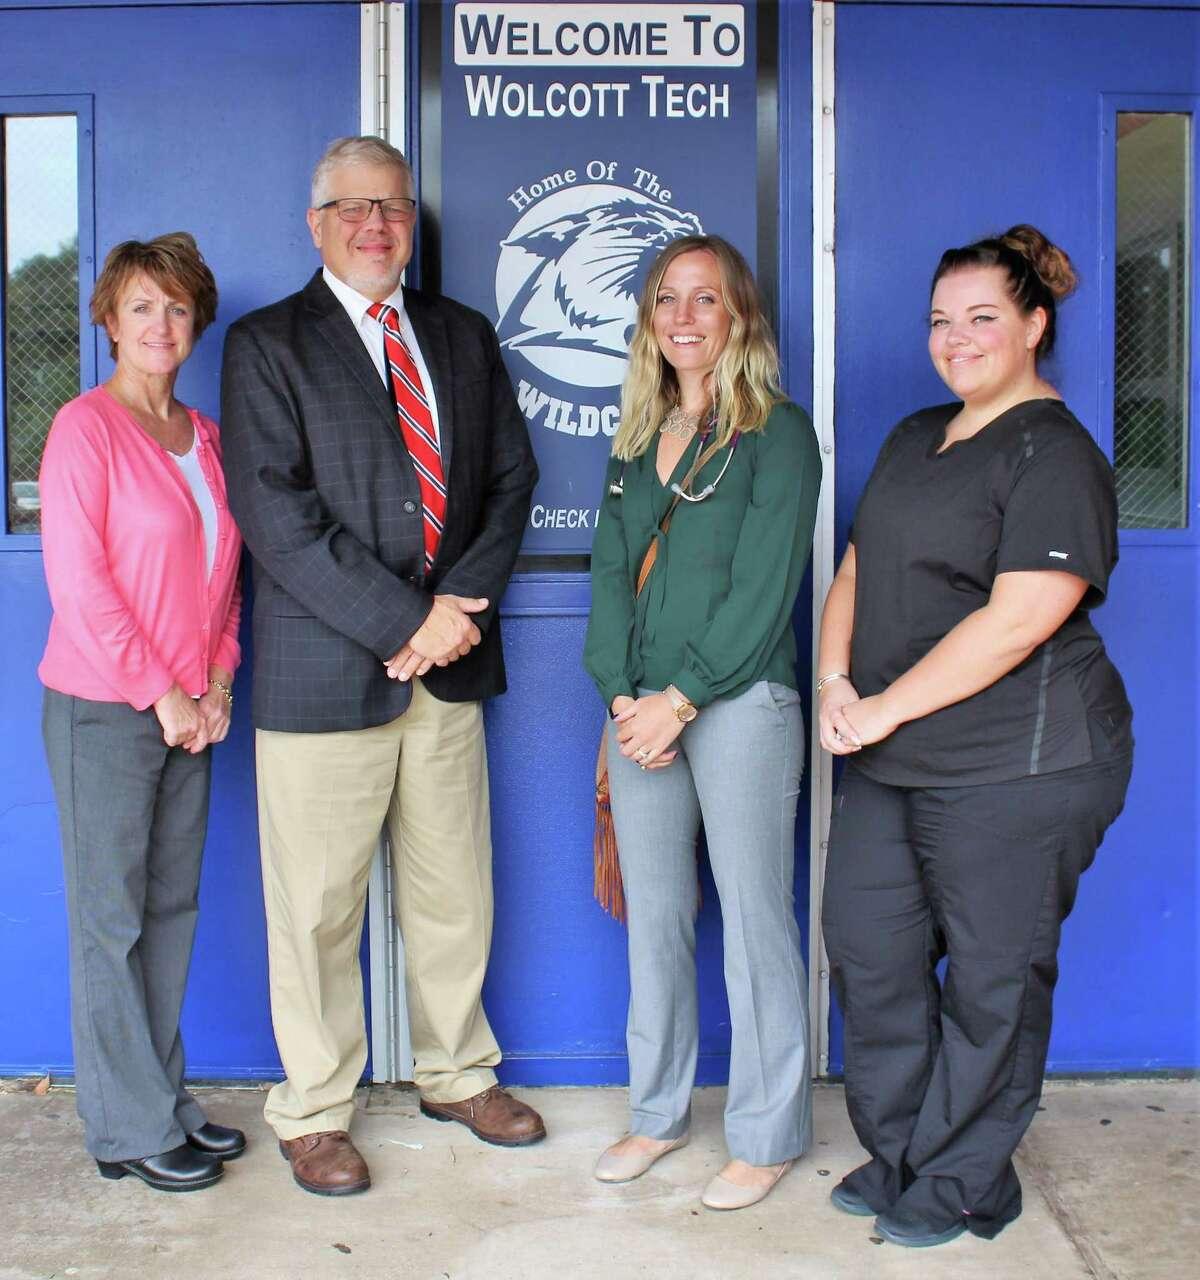 From left, Oliver Wolcott Technical High School nurse Debra Ismail, principal Richard Shellman, our provider, Jaimie Machado, RN, MSN, APRN and Grace Mottai, an LPN who assists Machado at the school.